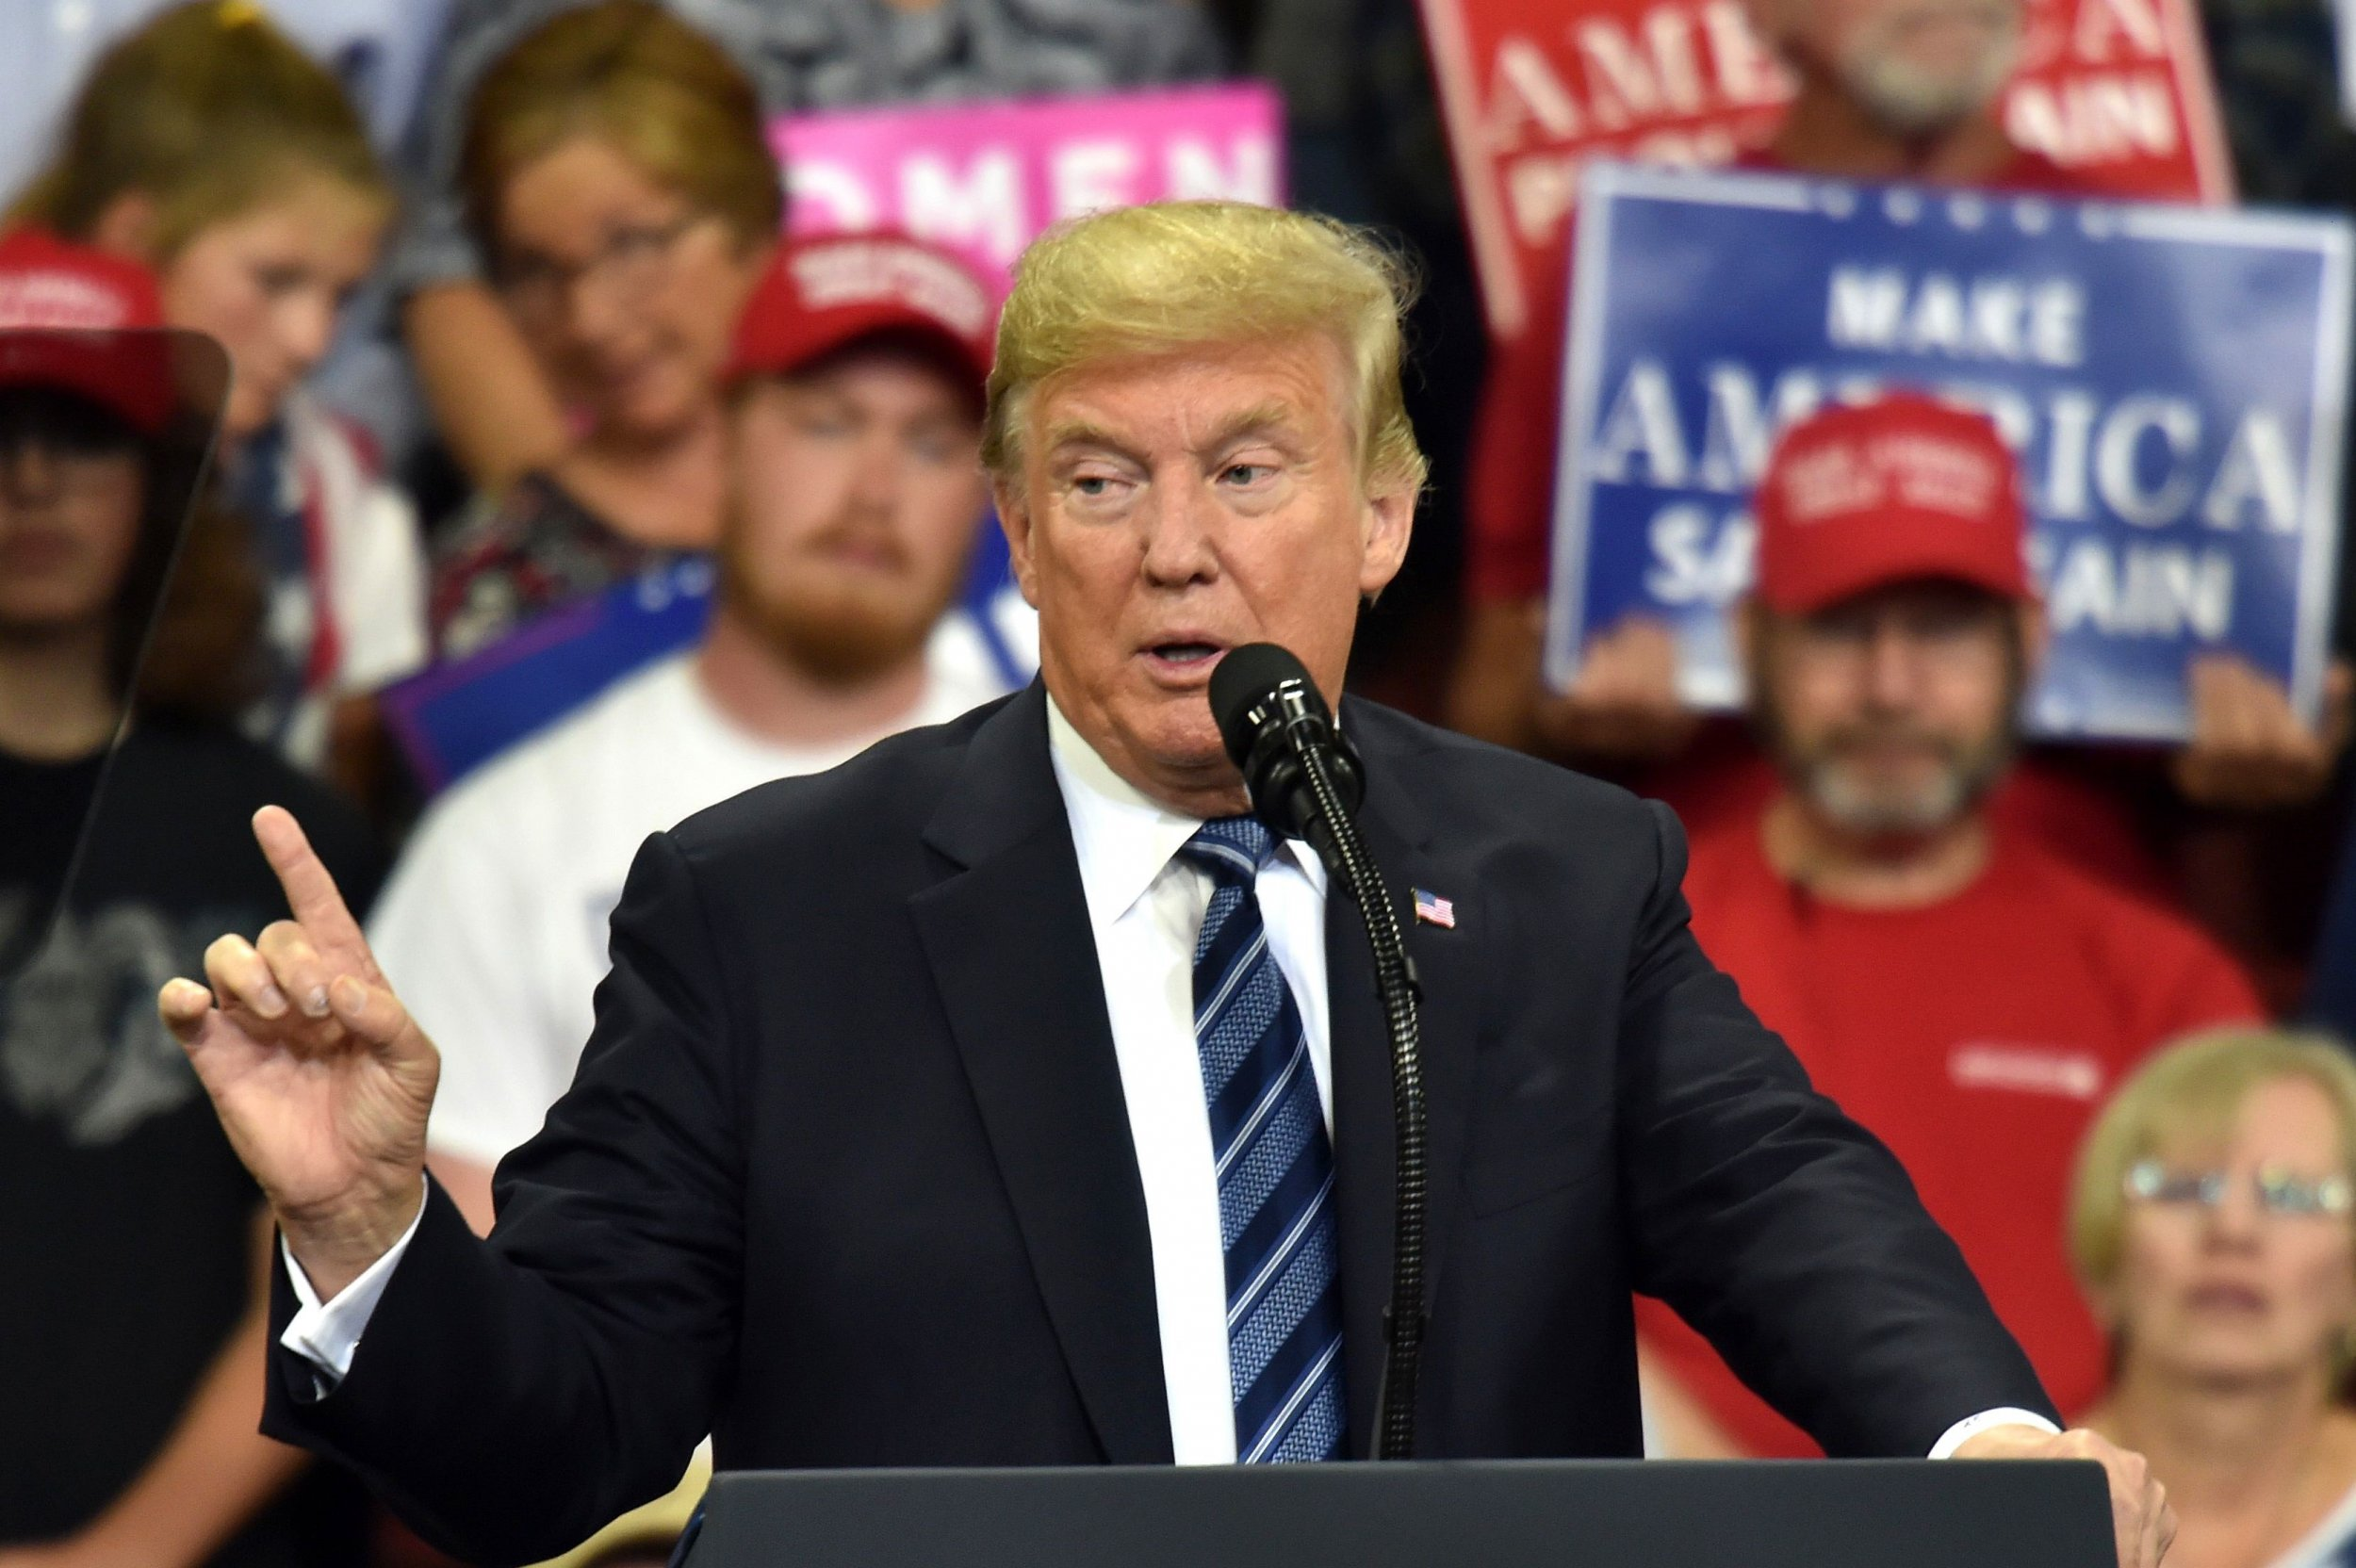 Donald Trump Montana rally